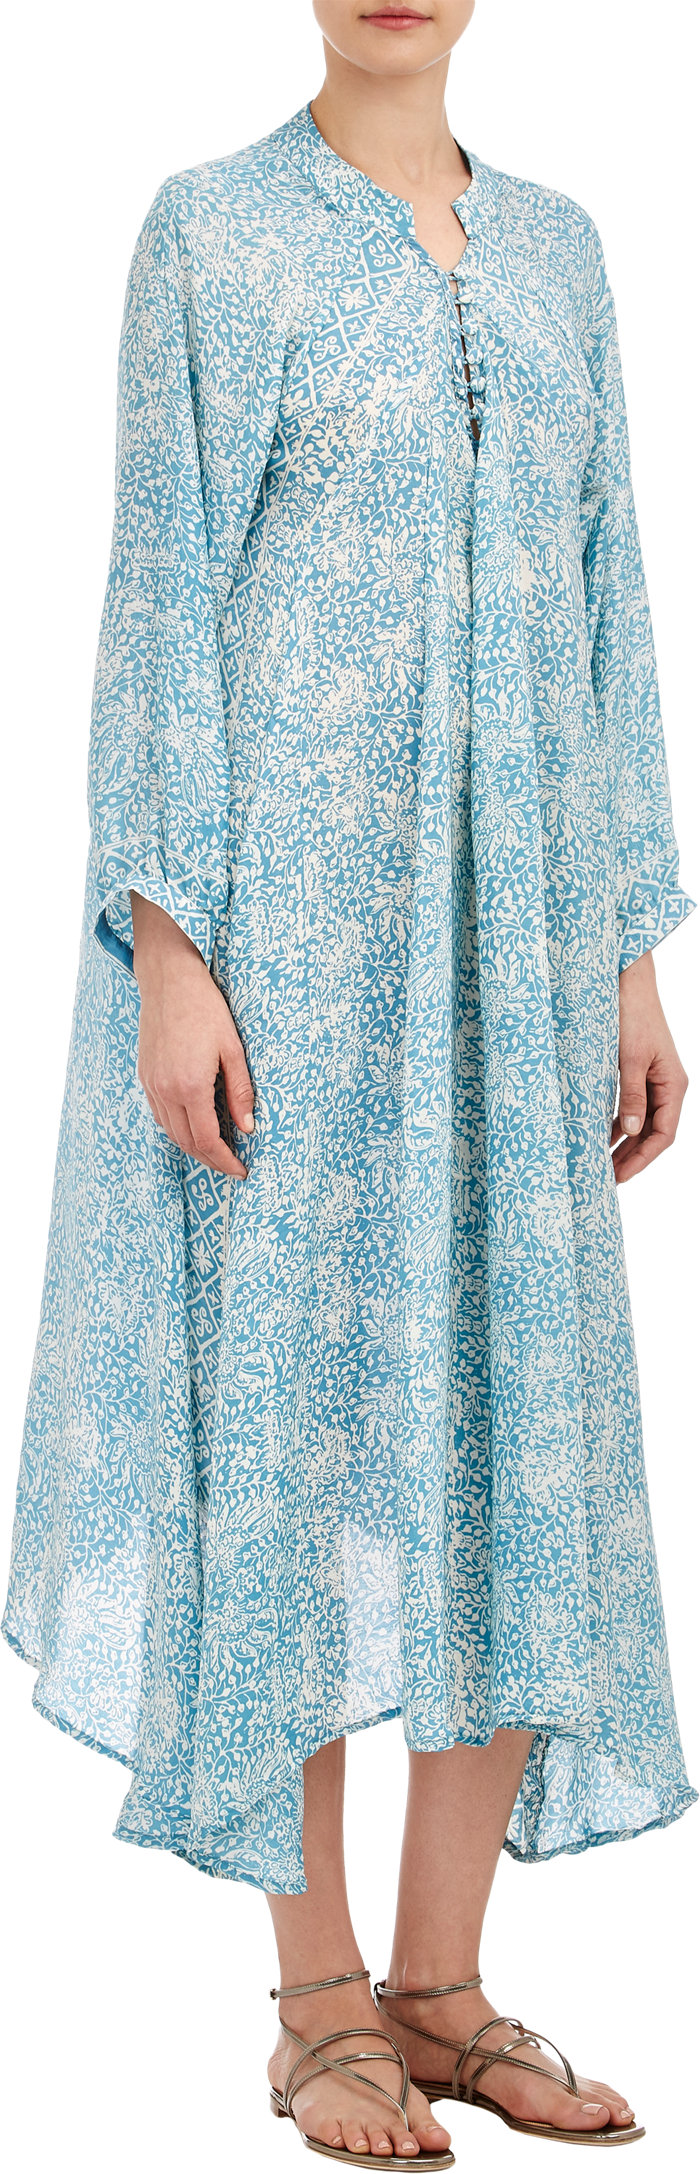 Natalie Martin Draped Fiore Maxi Dress At Barneys Com Maxi Dress Dresses Fashion [ 2174 x 700 Pixel ]